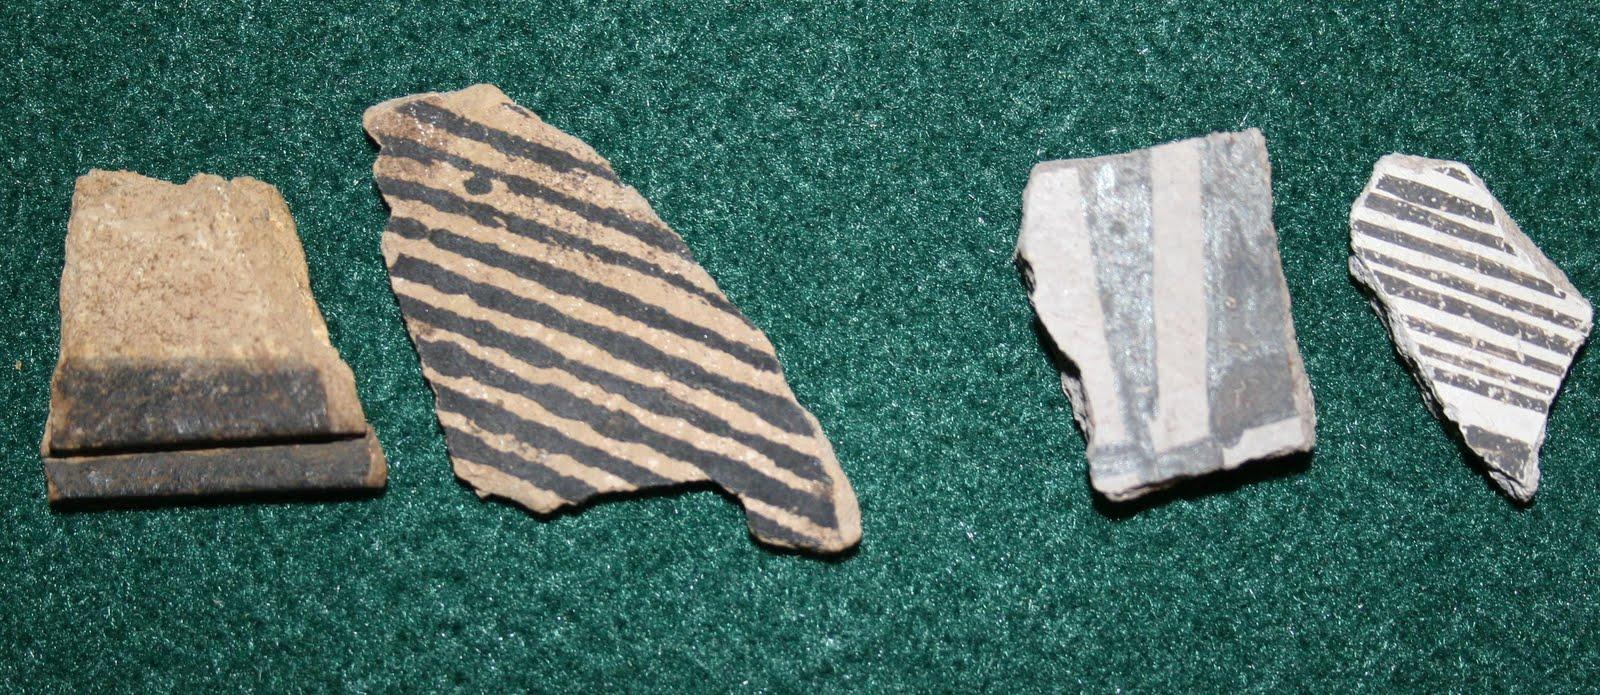 Rarepotteryfo blogspot prehistoric pottery sherd or asbestos prehistoric pottery sherd or asbestos floor tile dailygadgetfo Gallery